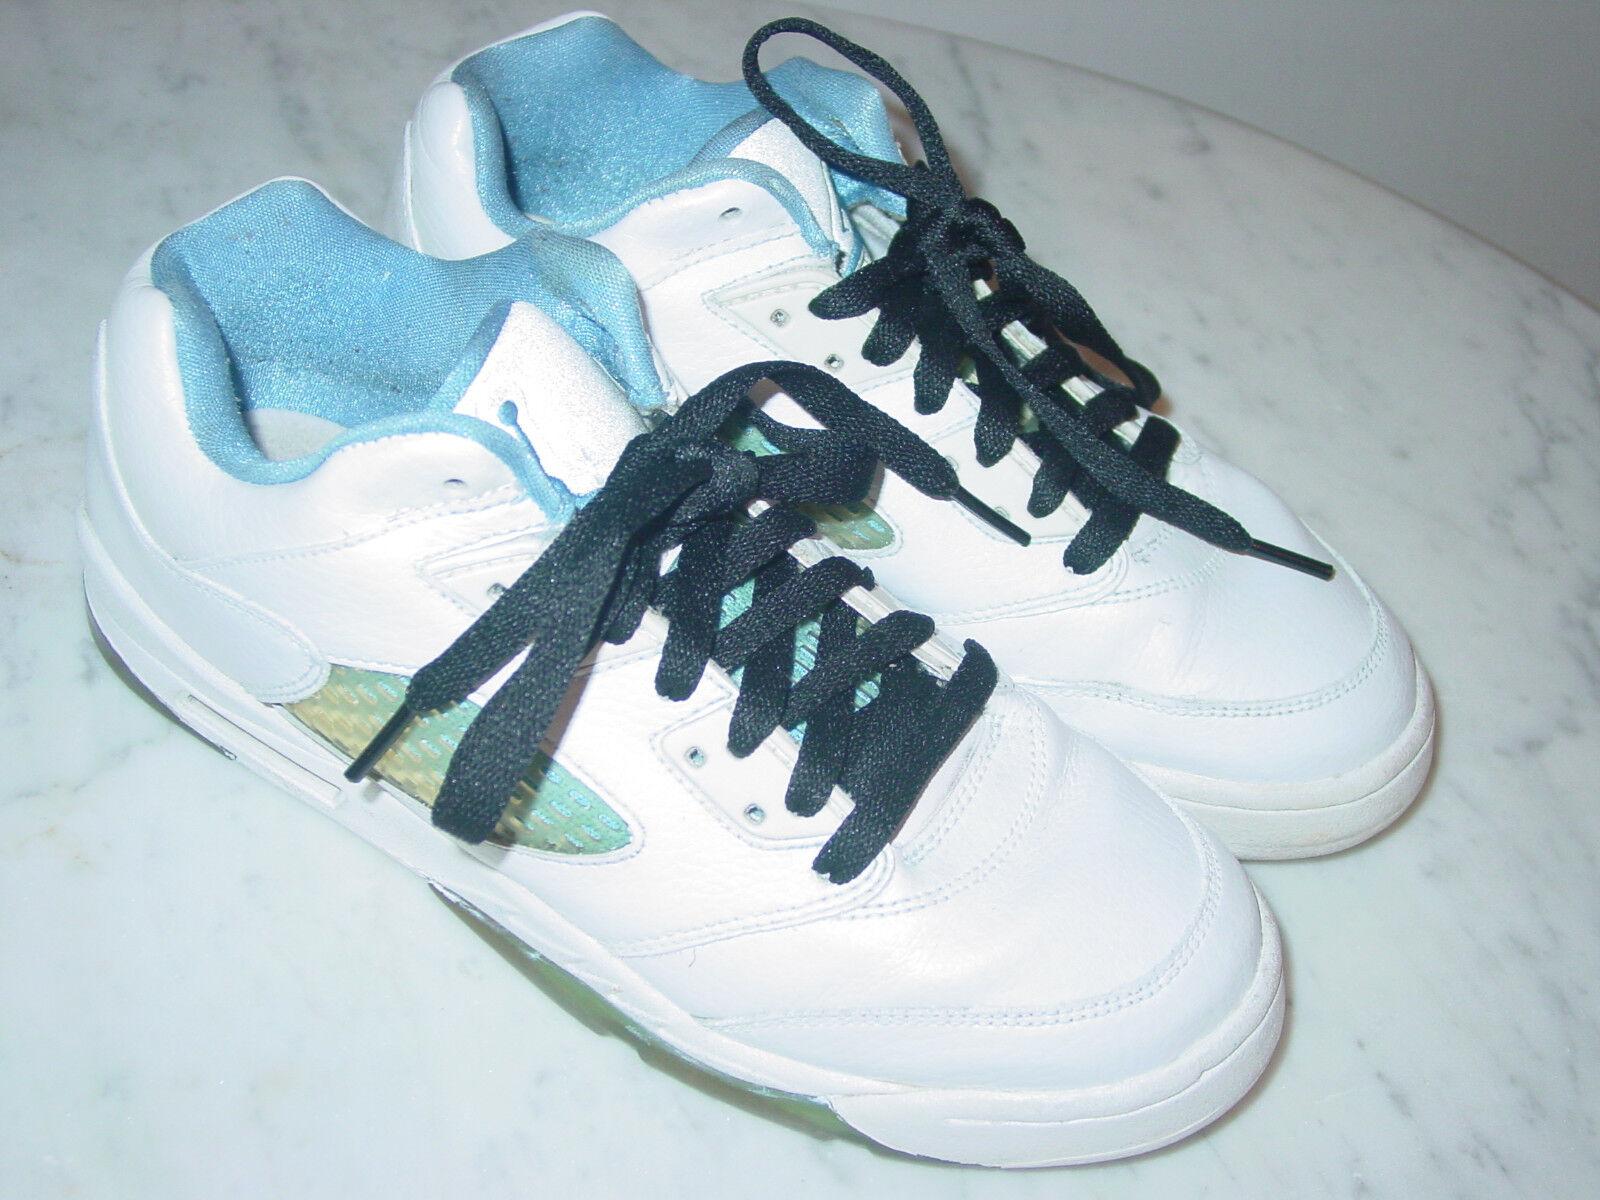 874159075ca Nike Air Jordan Retro 5 Low University Blue 6y Deadstock for sale ...